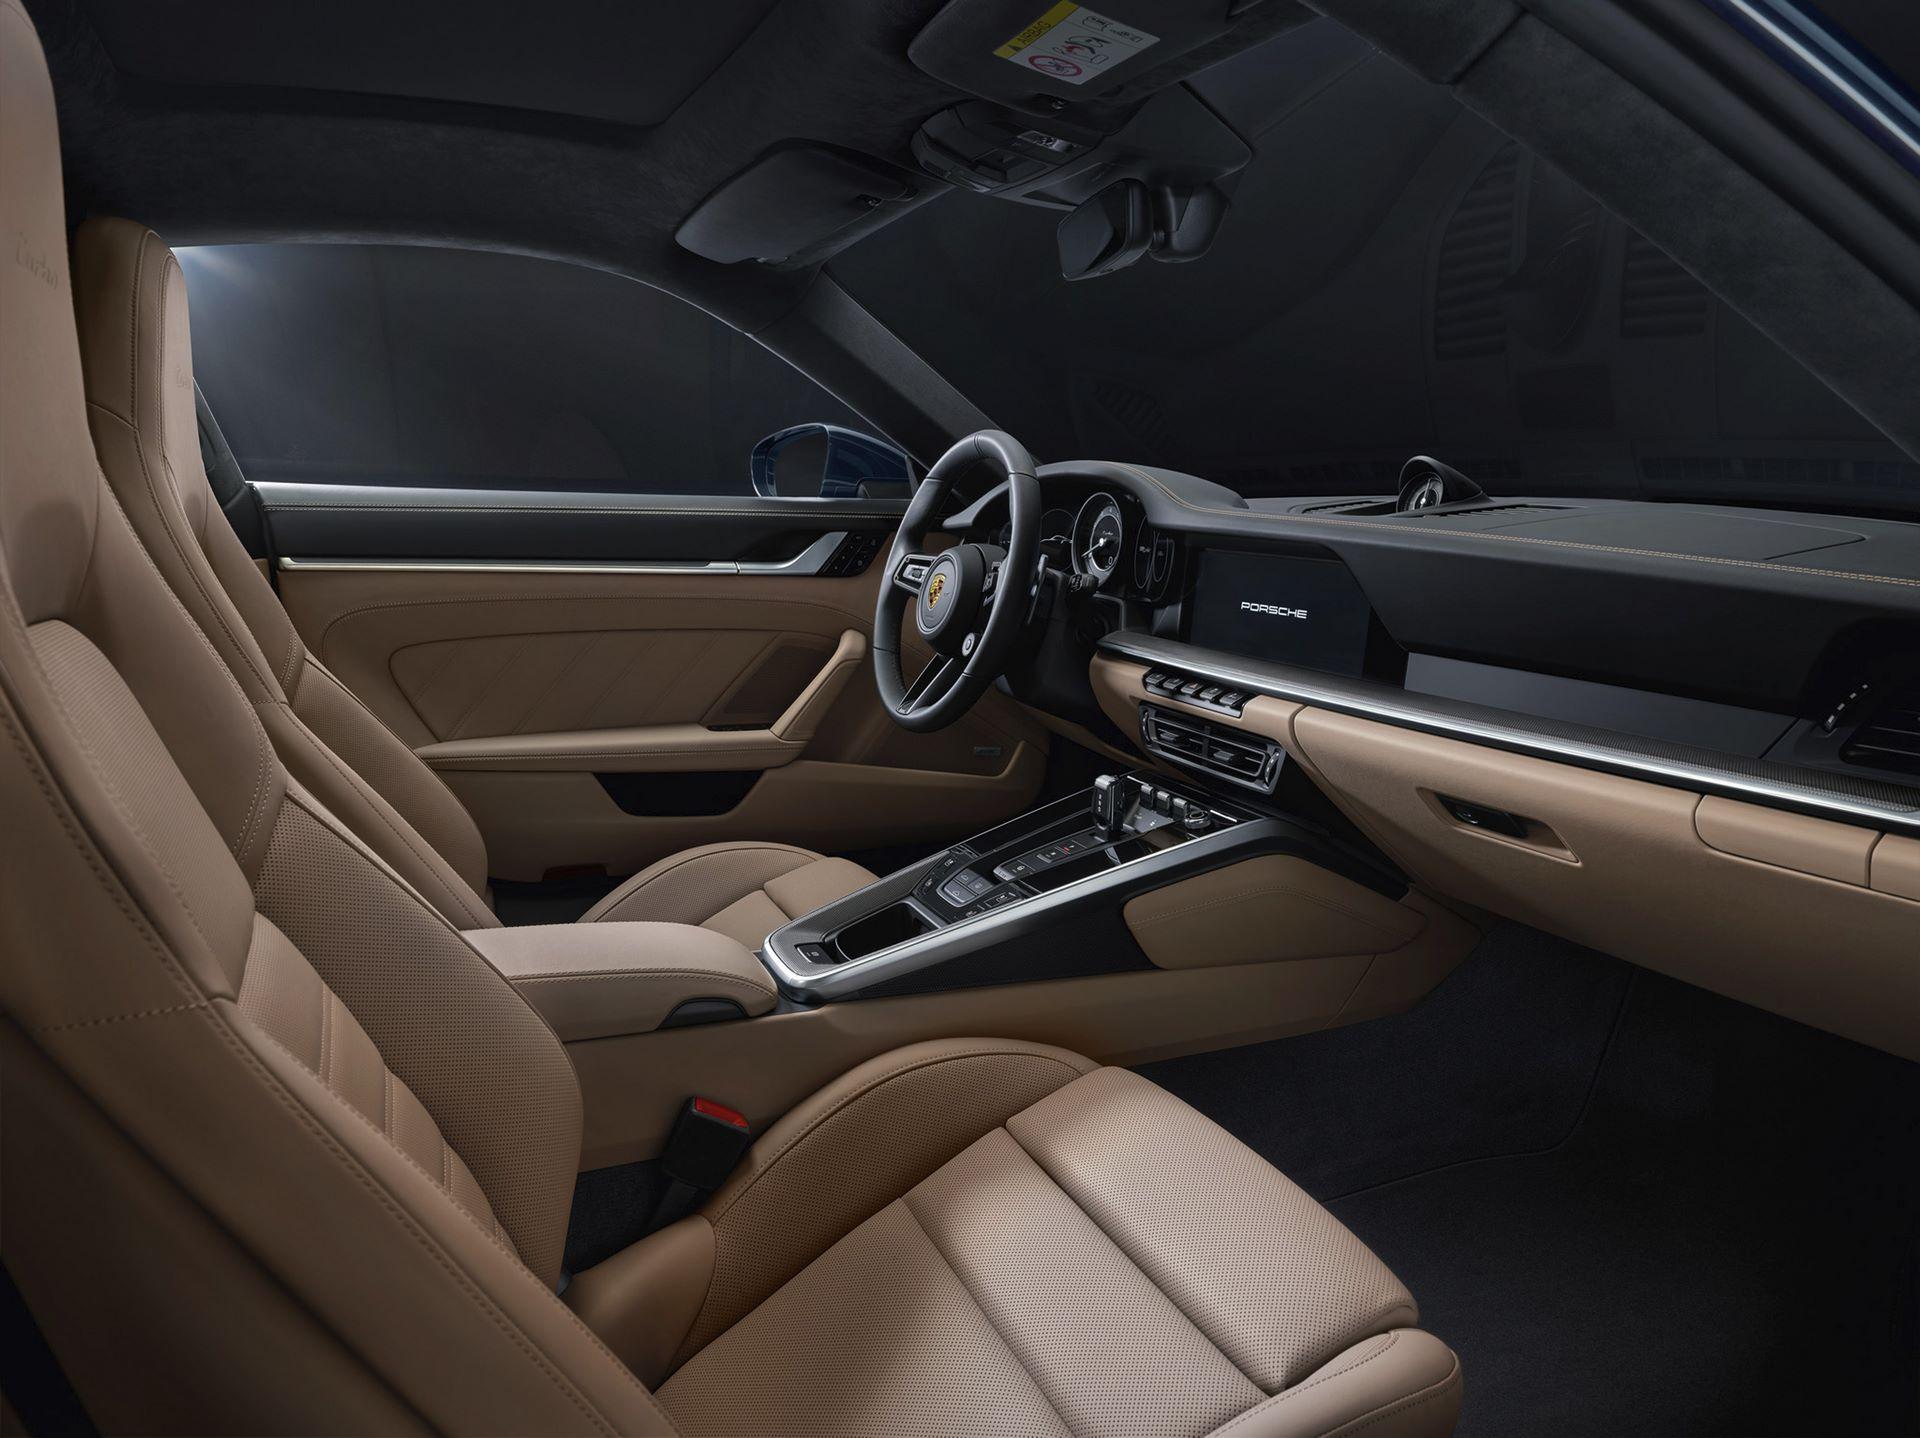 Porsche-911-Turbo-2020-15